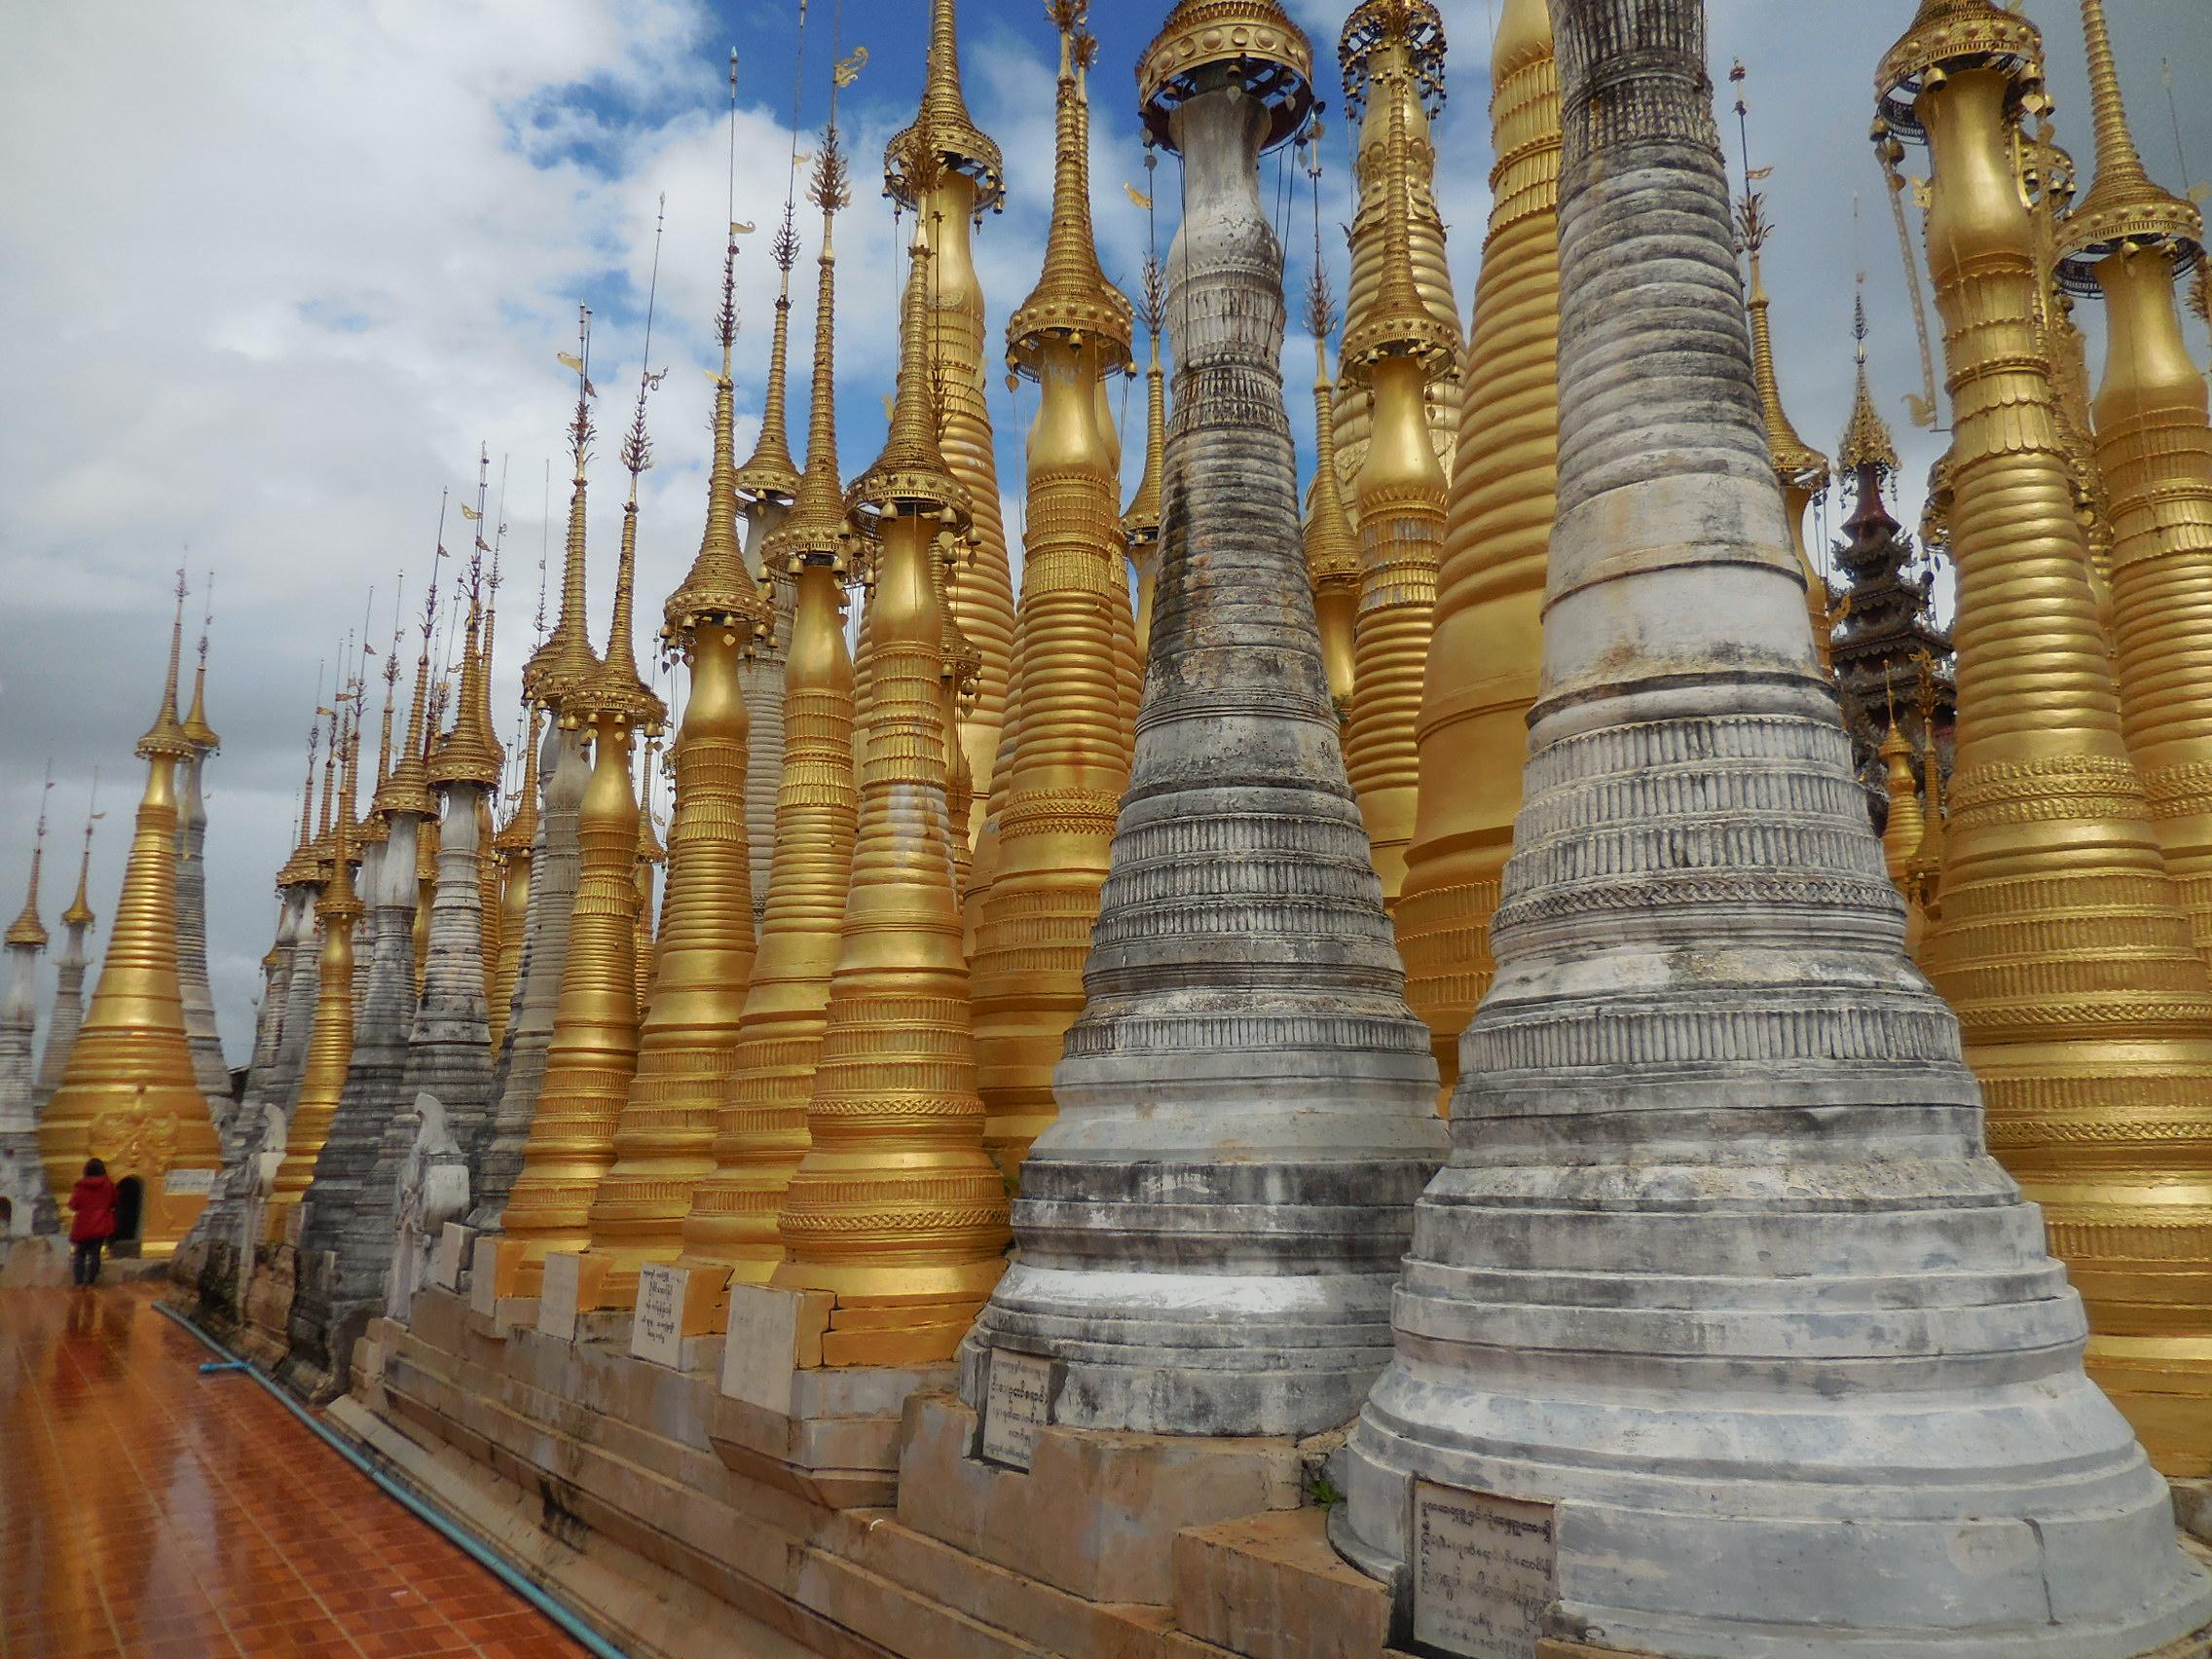 Les Perles de Birmanie